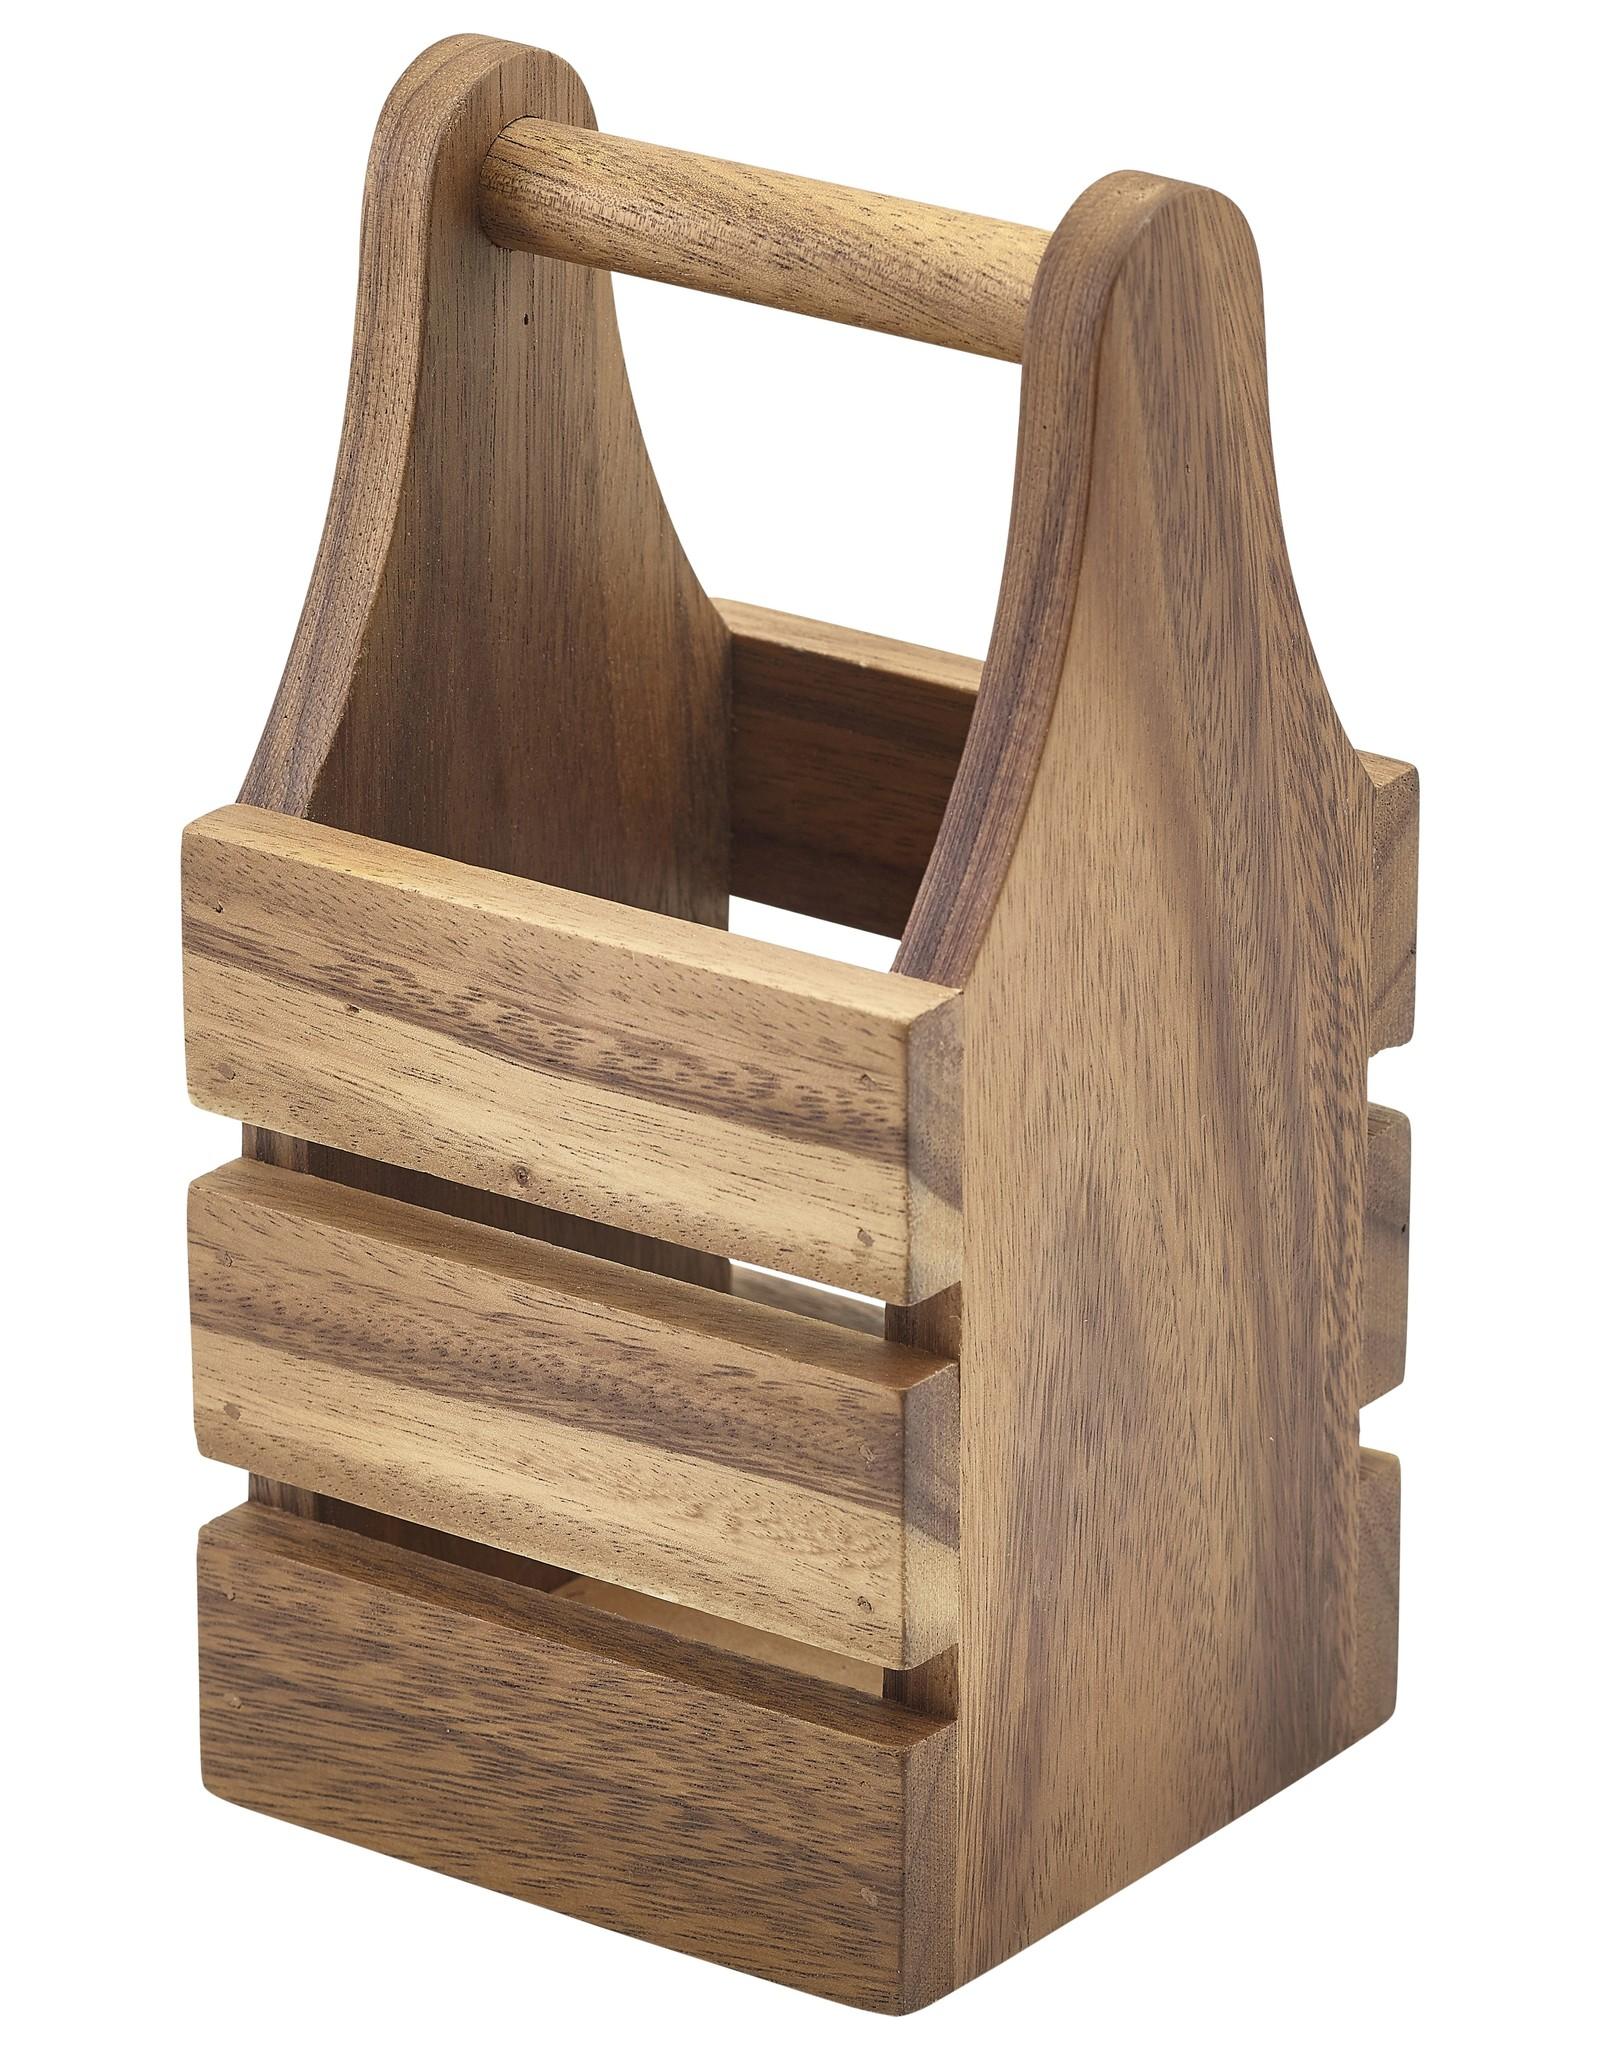 Stylepoint Acacia bestek houder 10x10x20cm